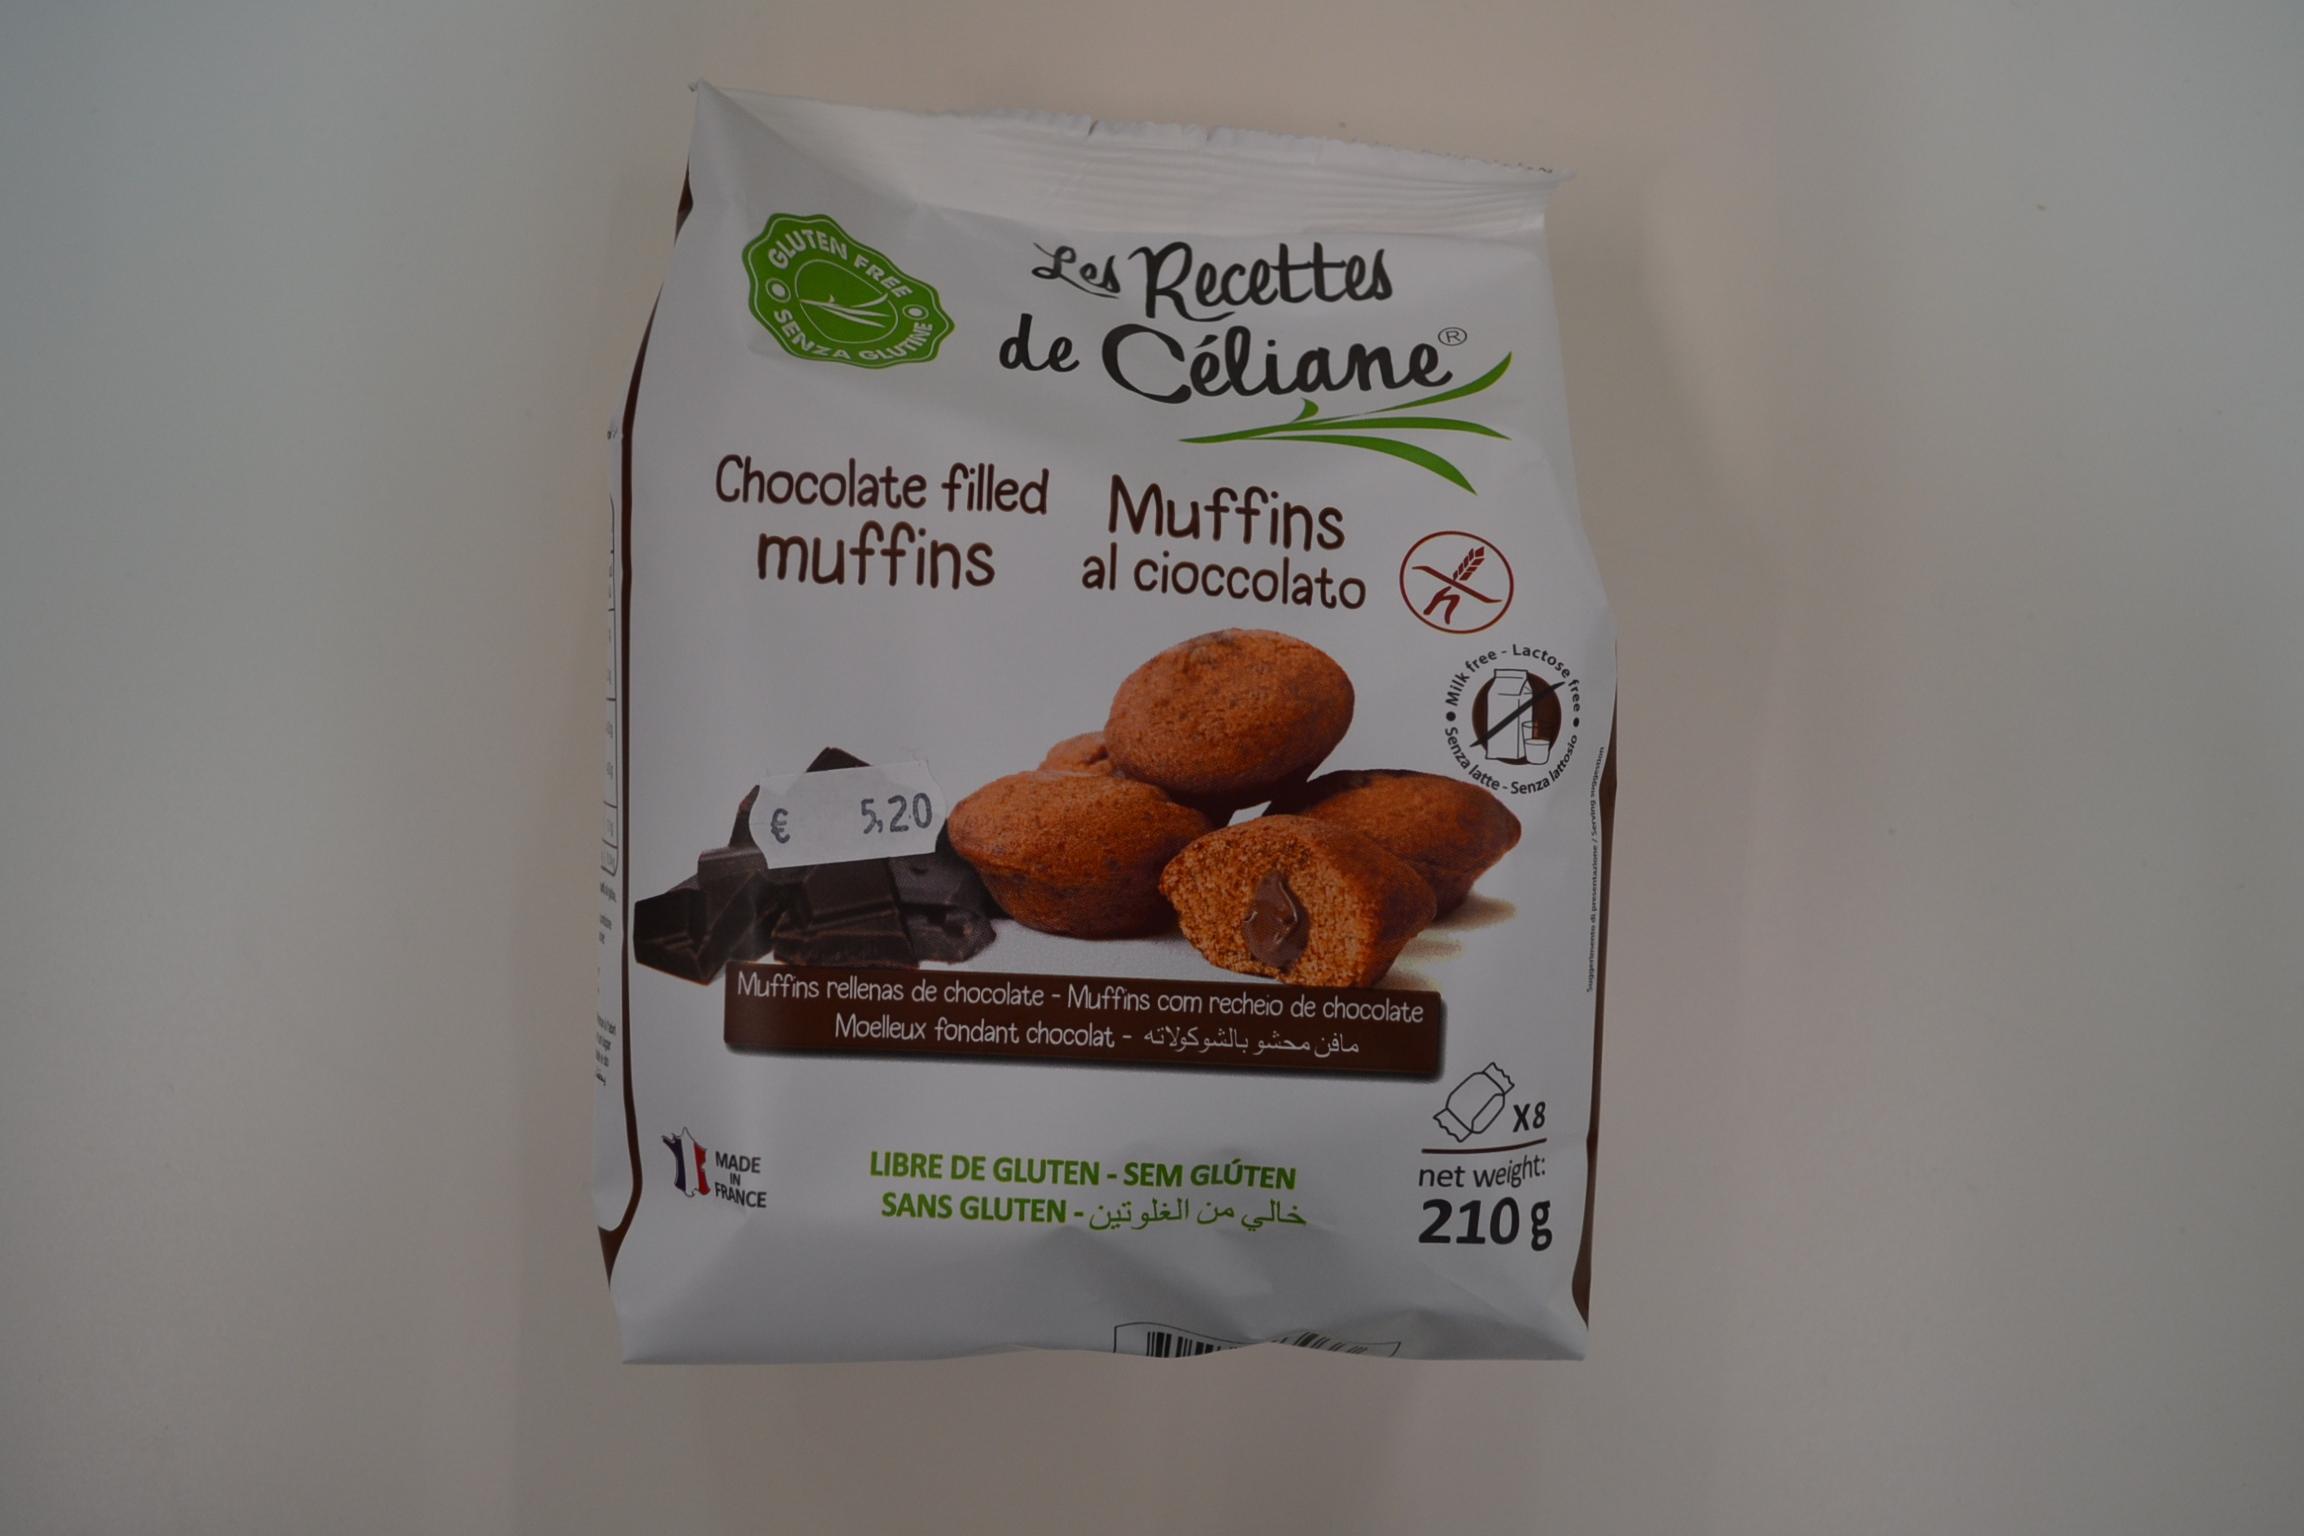 Muffins al cioccolato LES RECETTES DE CELIANE